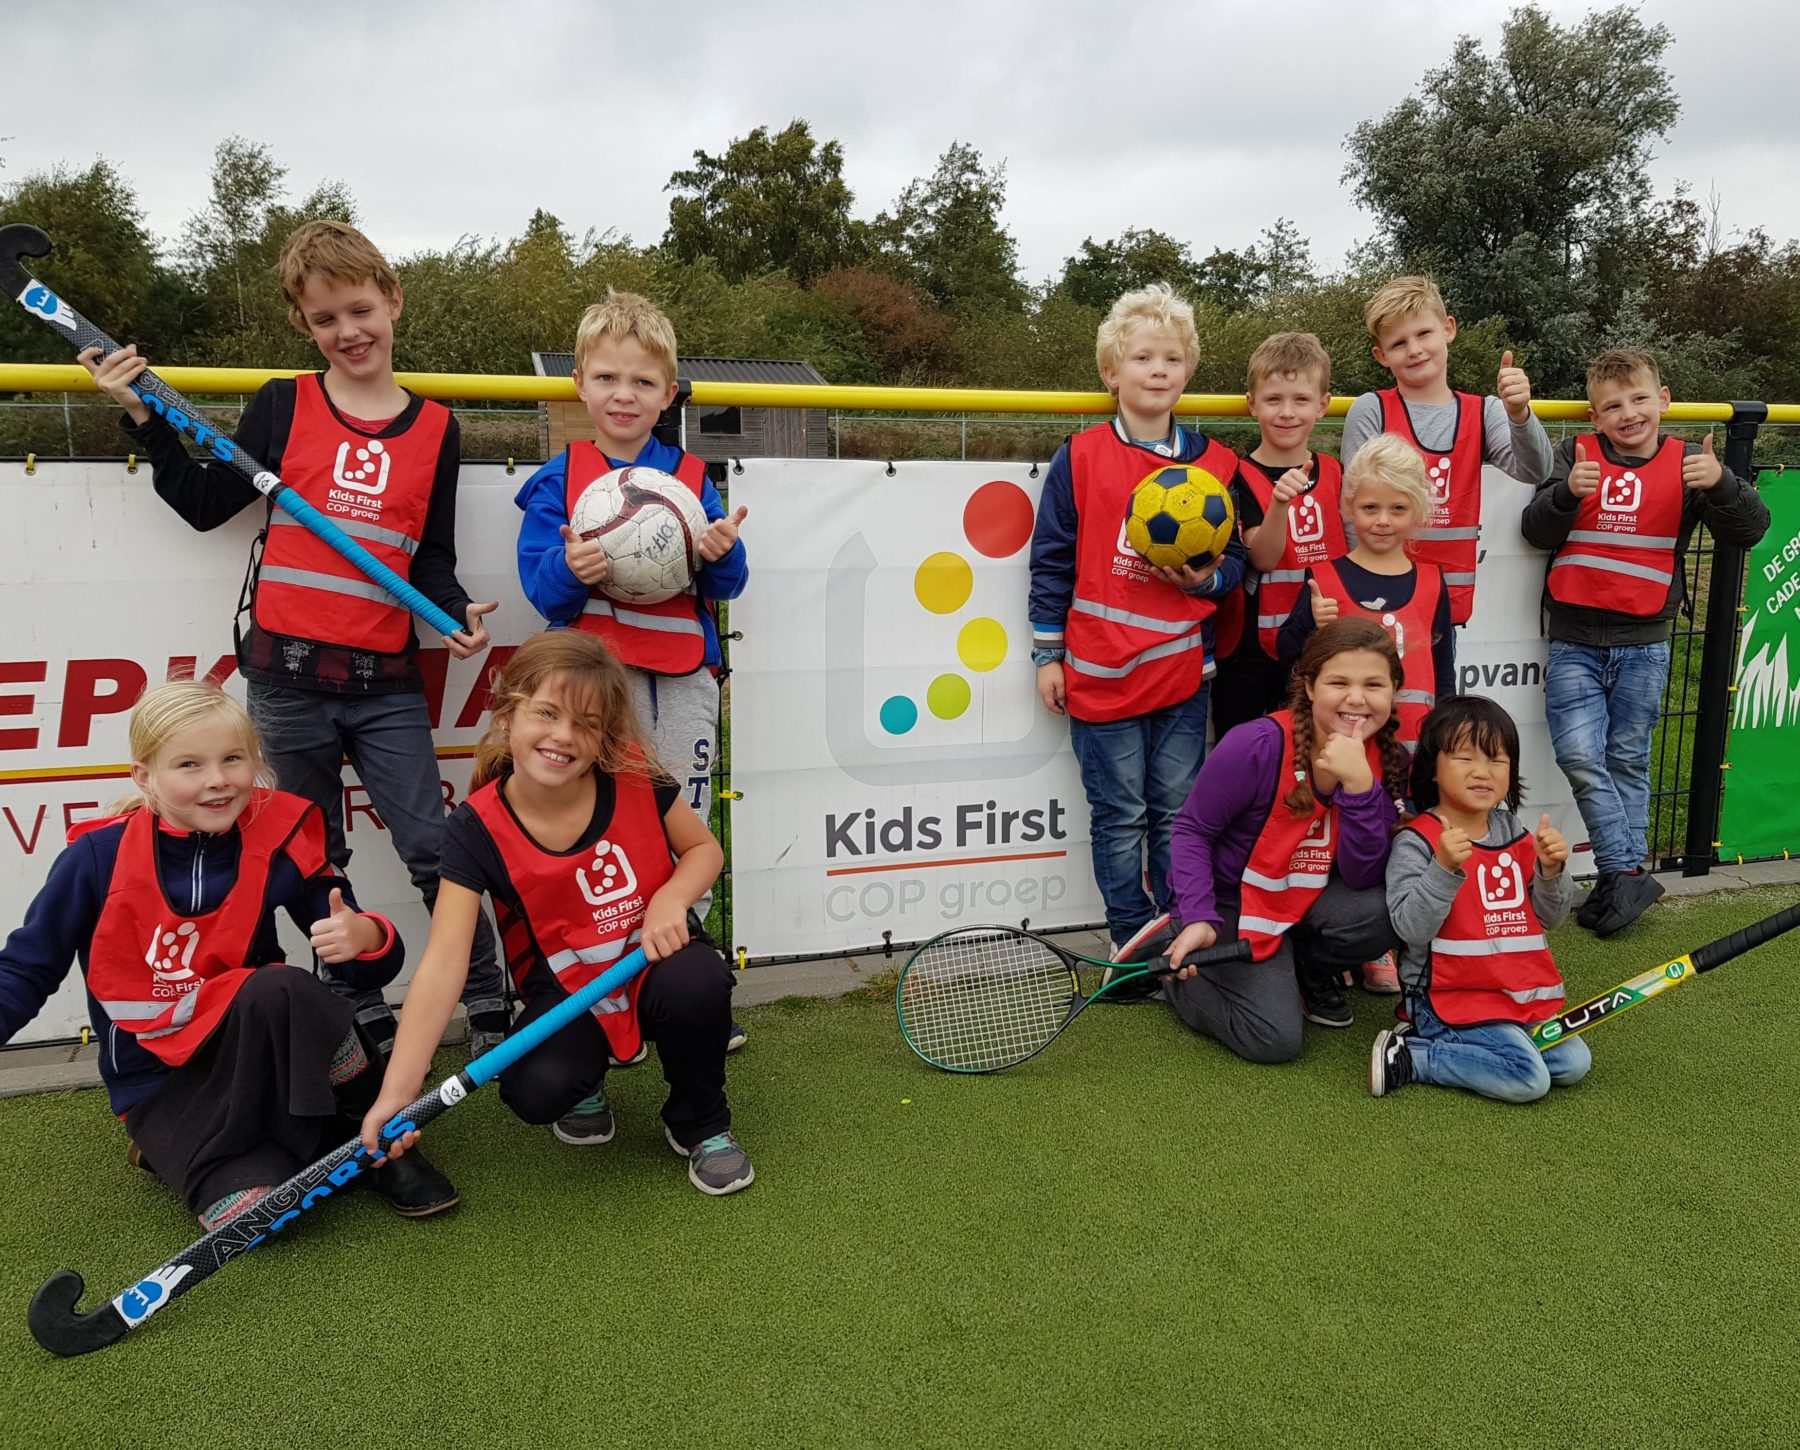 Buitenschoolse opvang 4 - 12 jaar - BSO Kids First COP groep